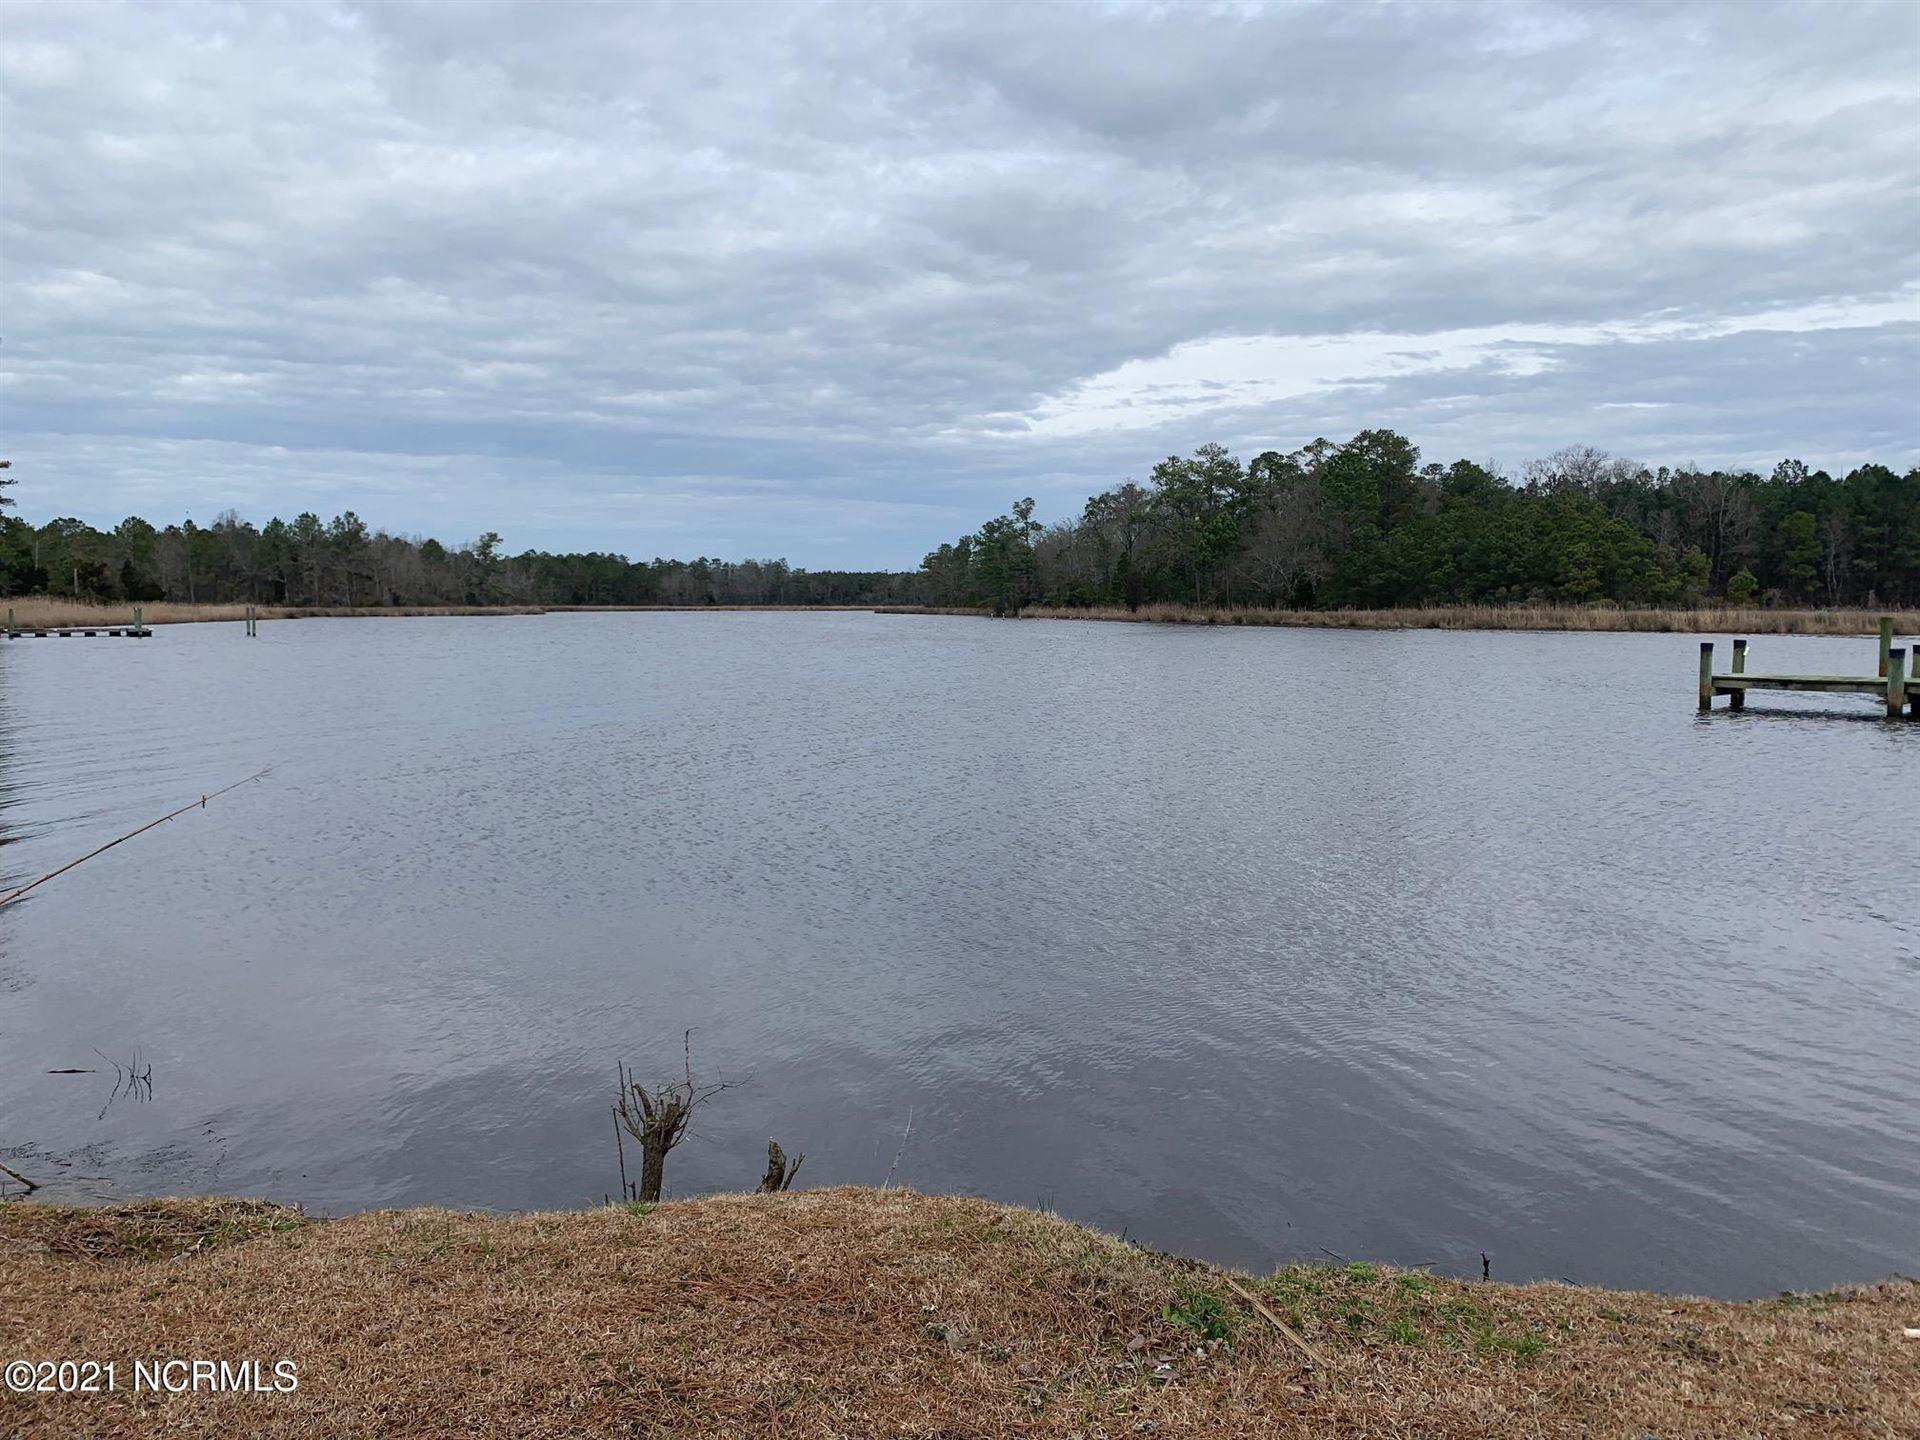 Photo of Lot 36 N Creek Drive, Belhaven, NC 27810 (MLS # 100258738)